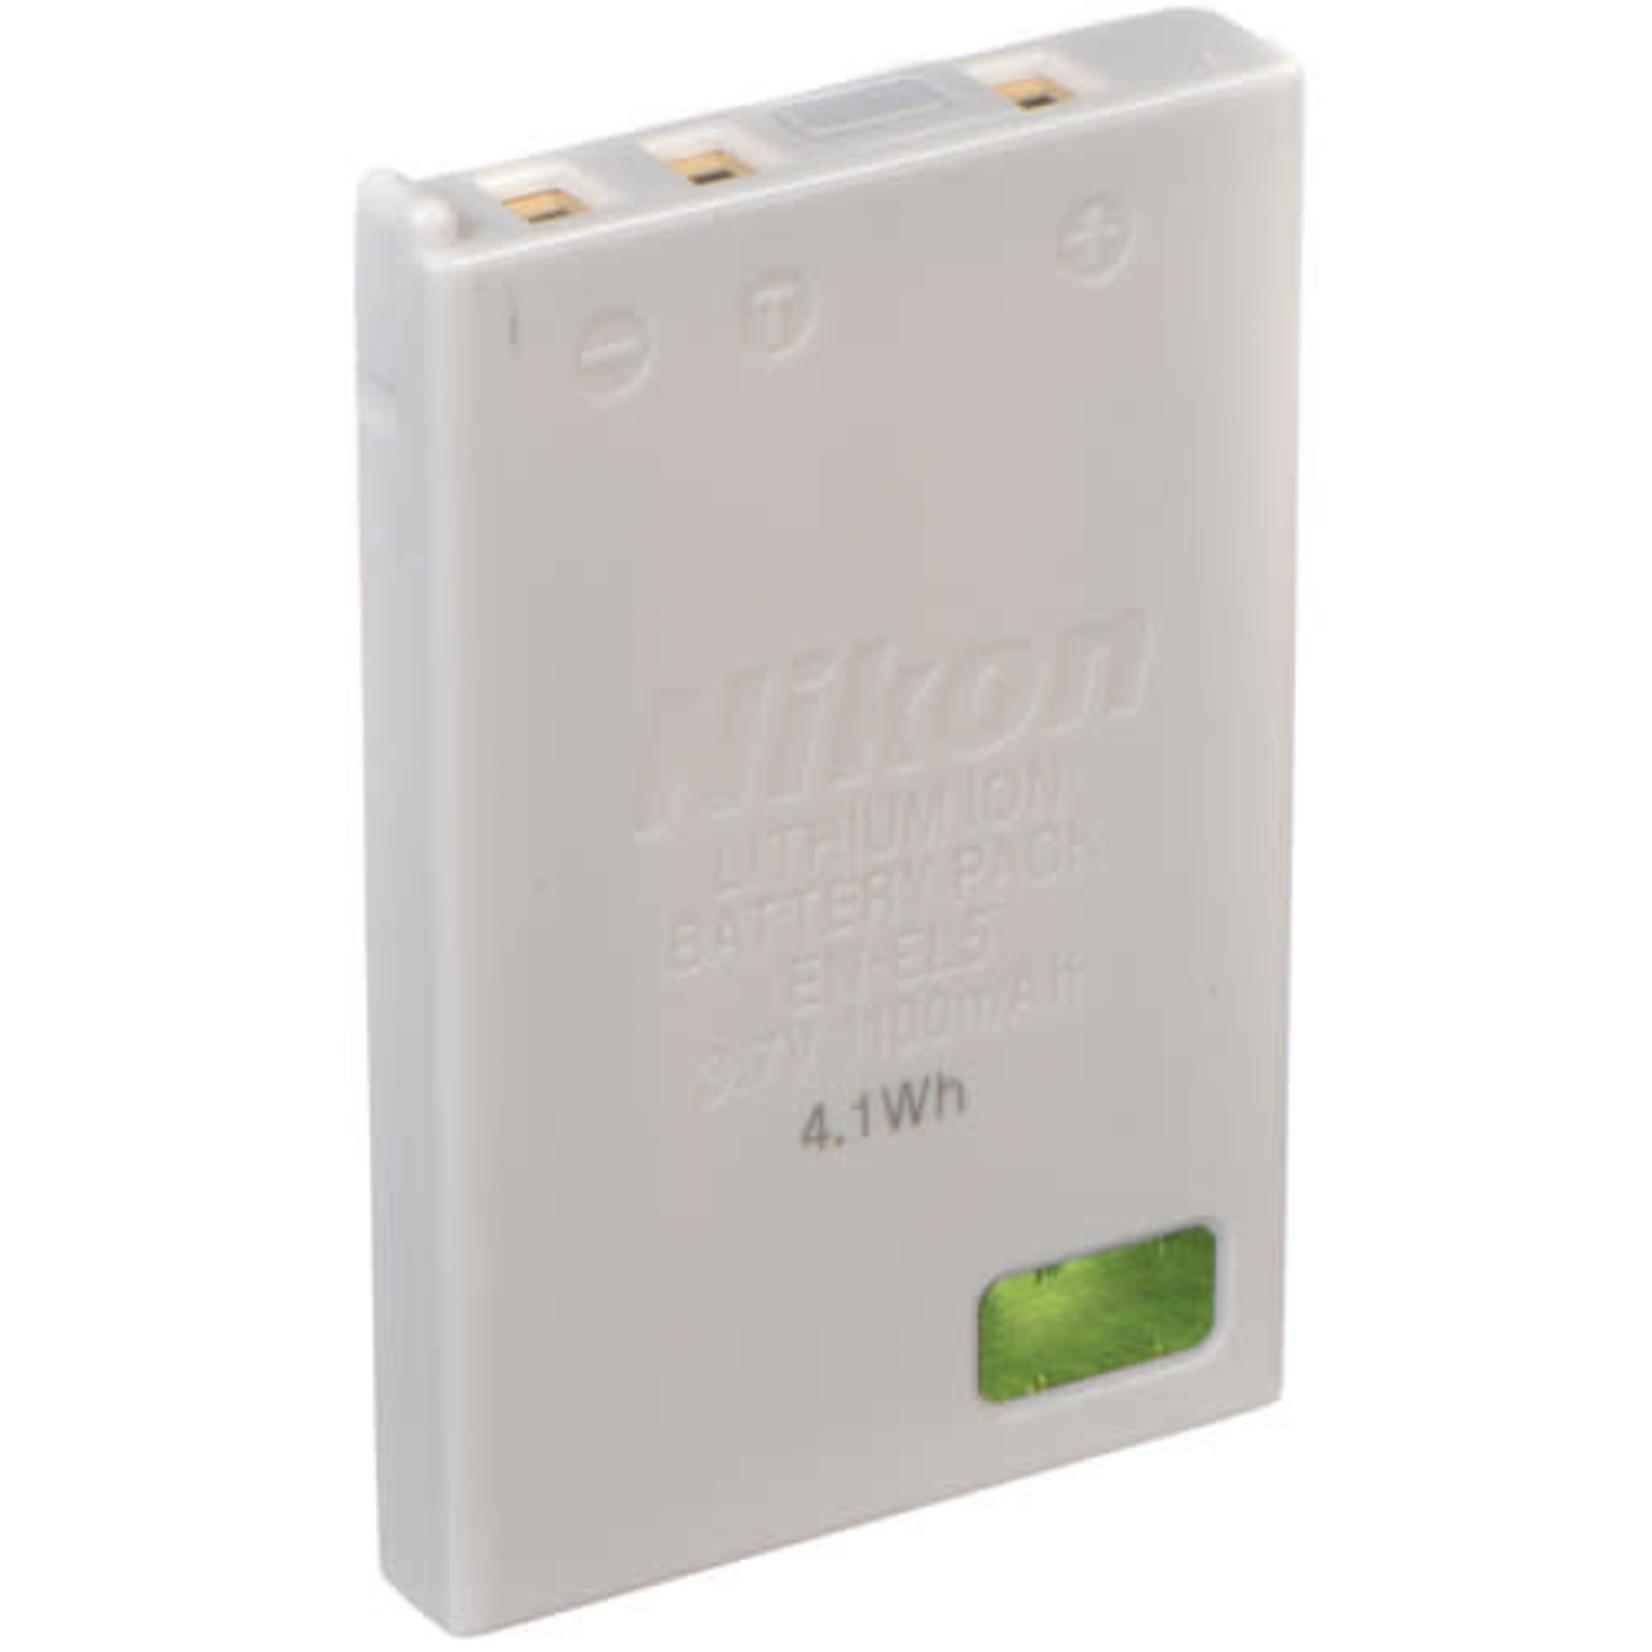 Nikon Nikon EN-EL5 Lithium-Ion Battery (3.7v 1100mAh)